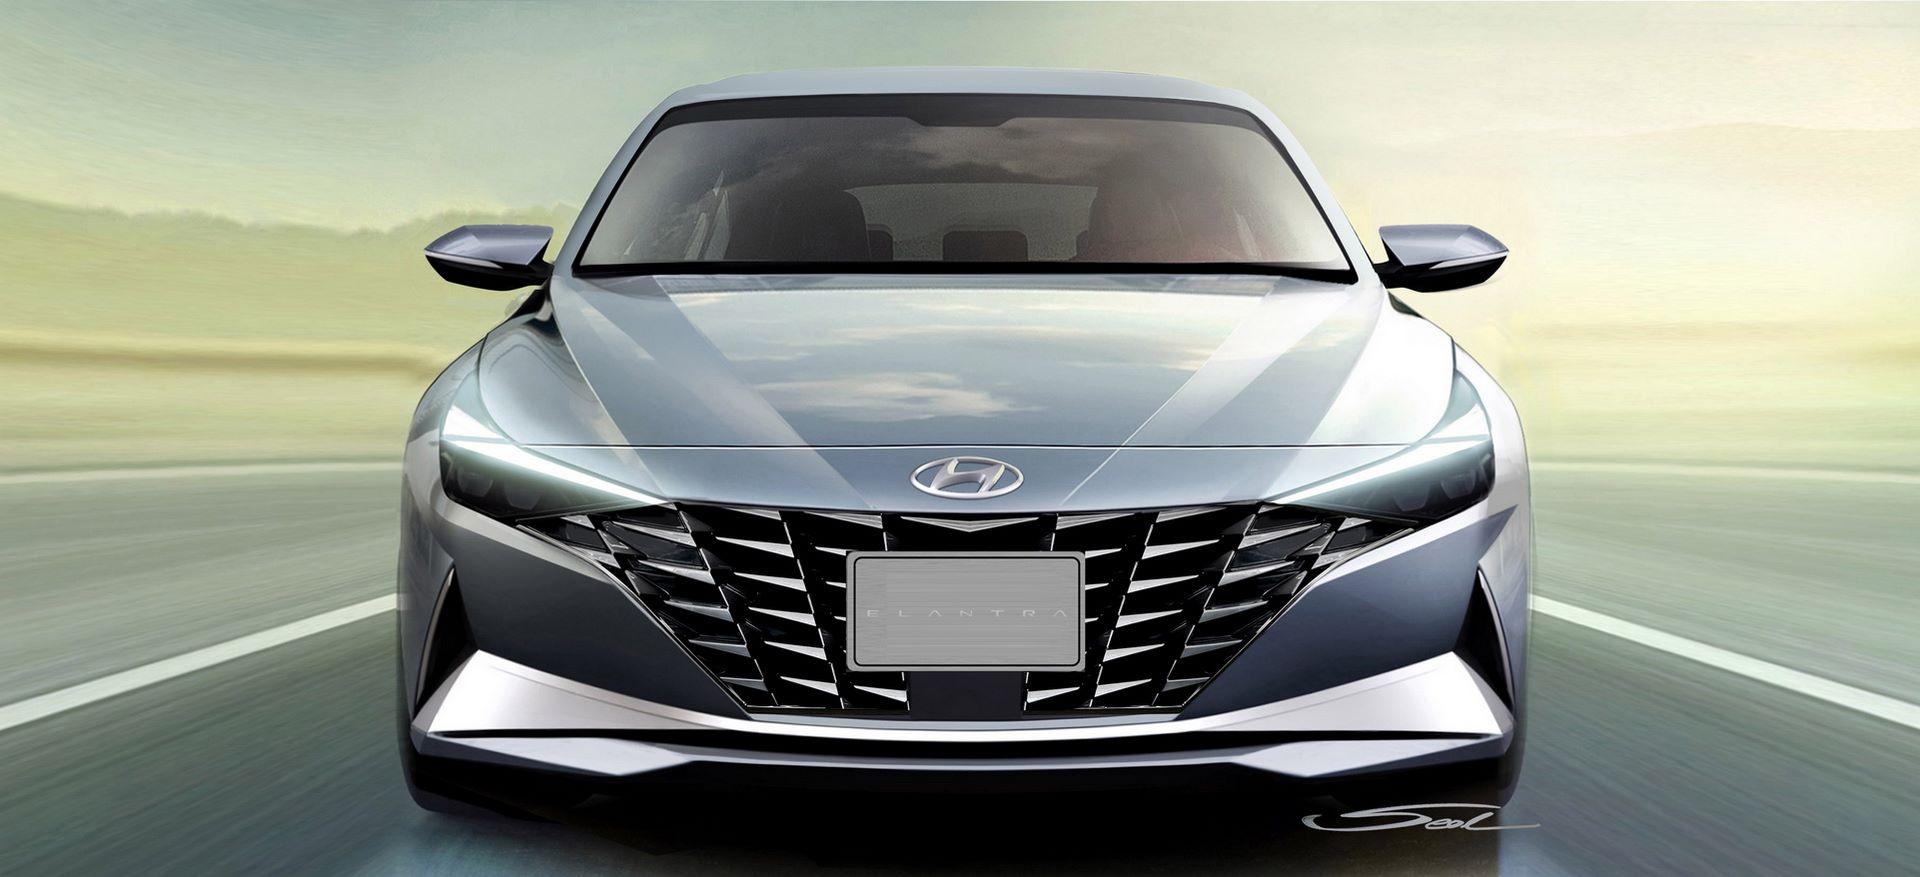 Hyundai-Elantra-2021-9